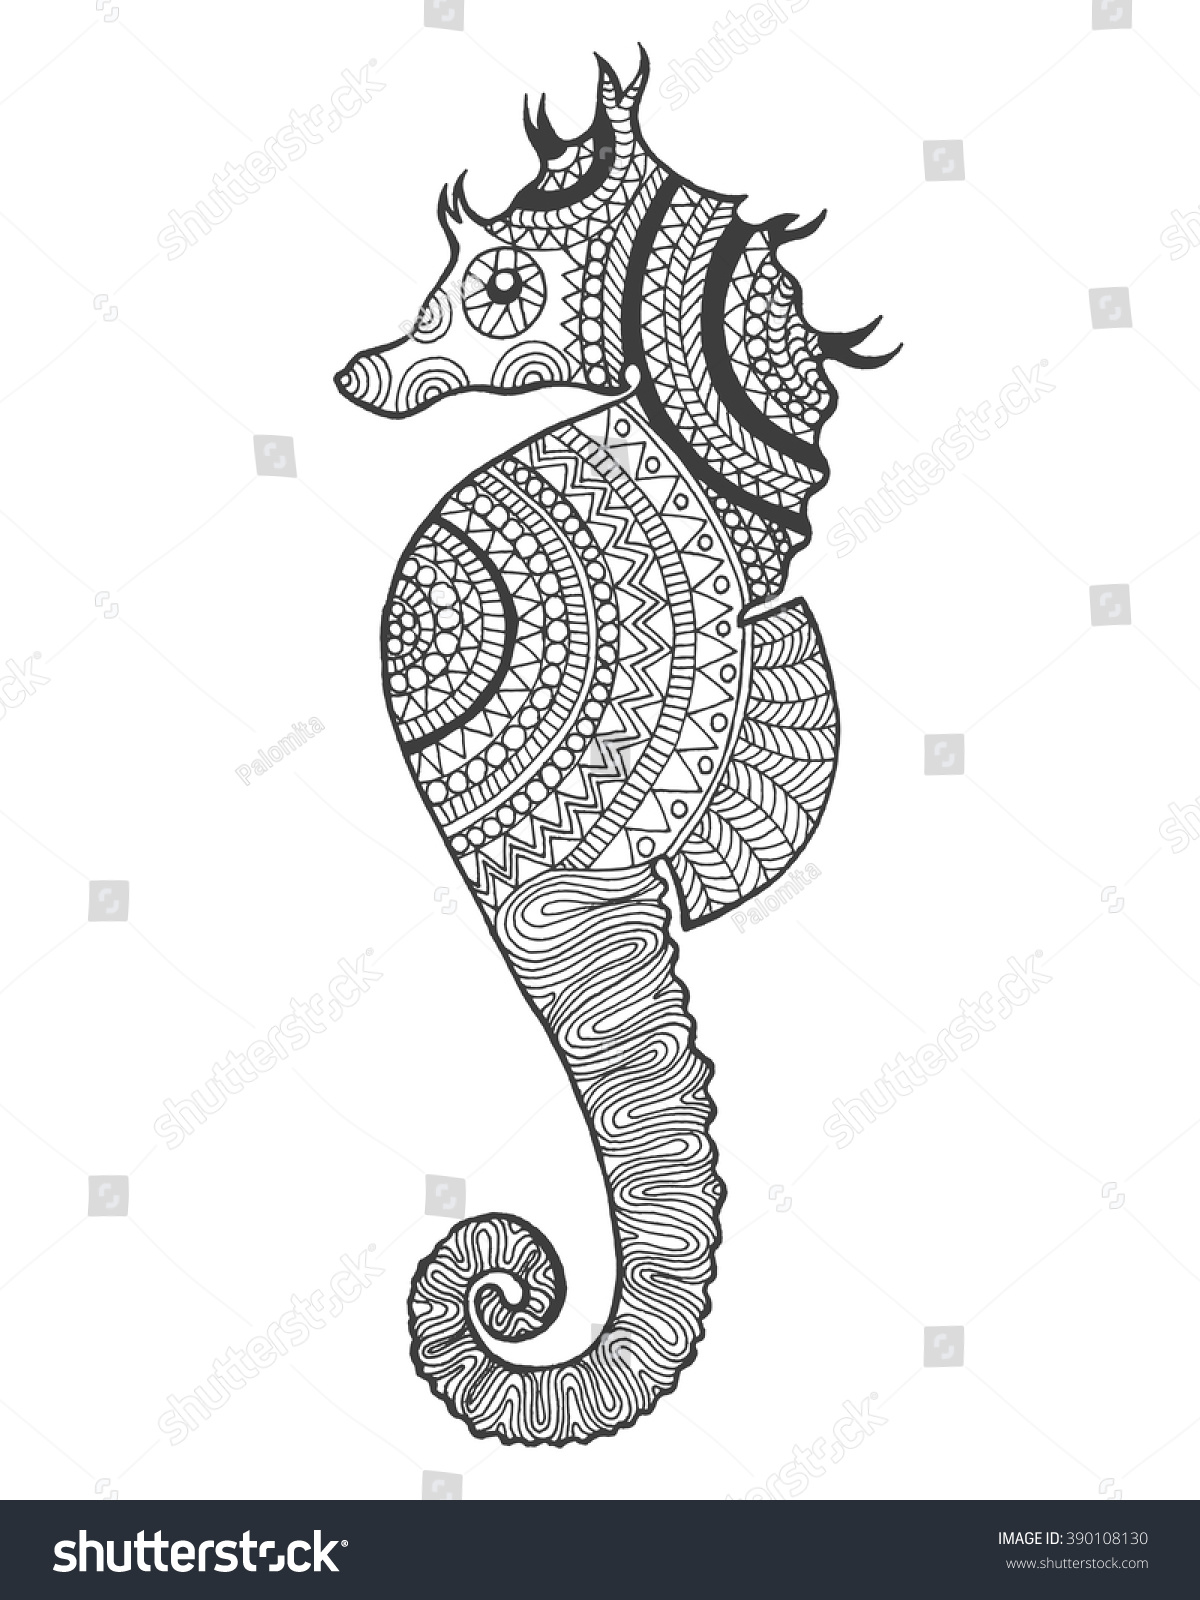 Zentangle Stylized Seahorse Hand Drawn Doodle Stock Photo (Photo ...